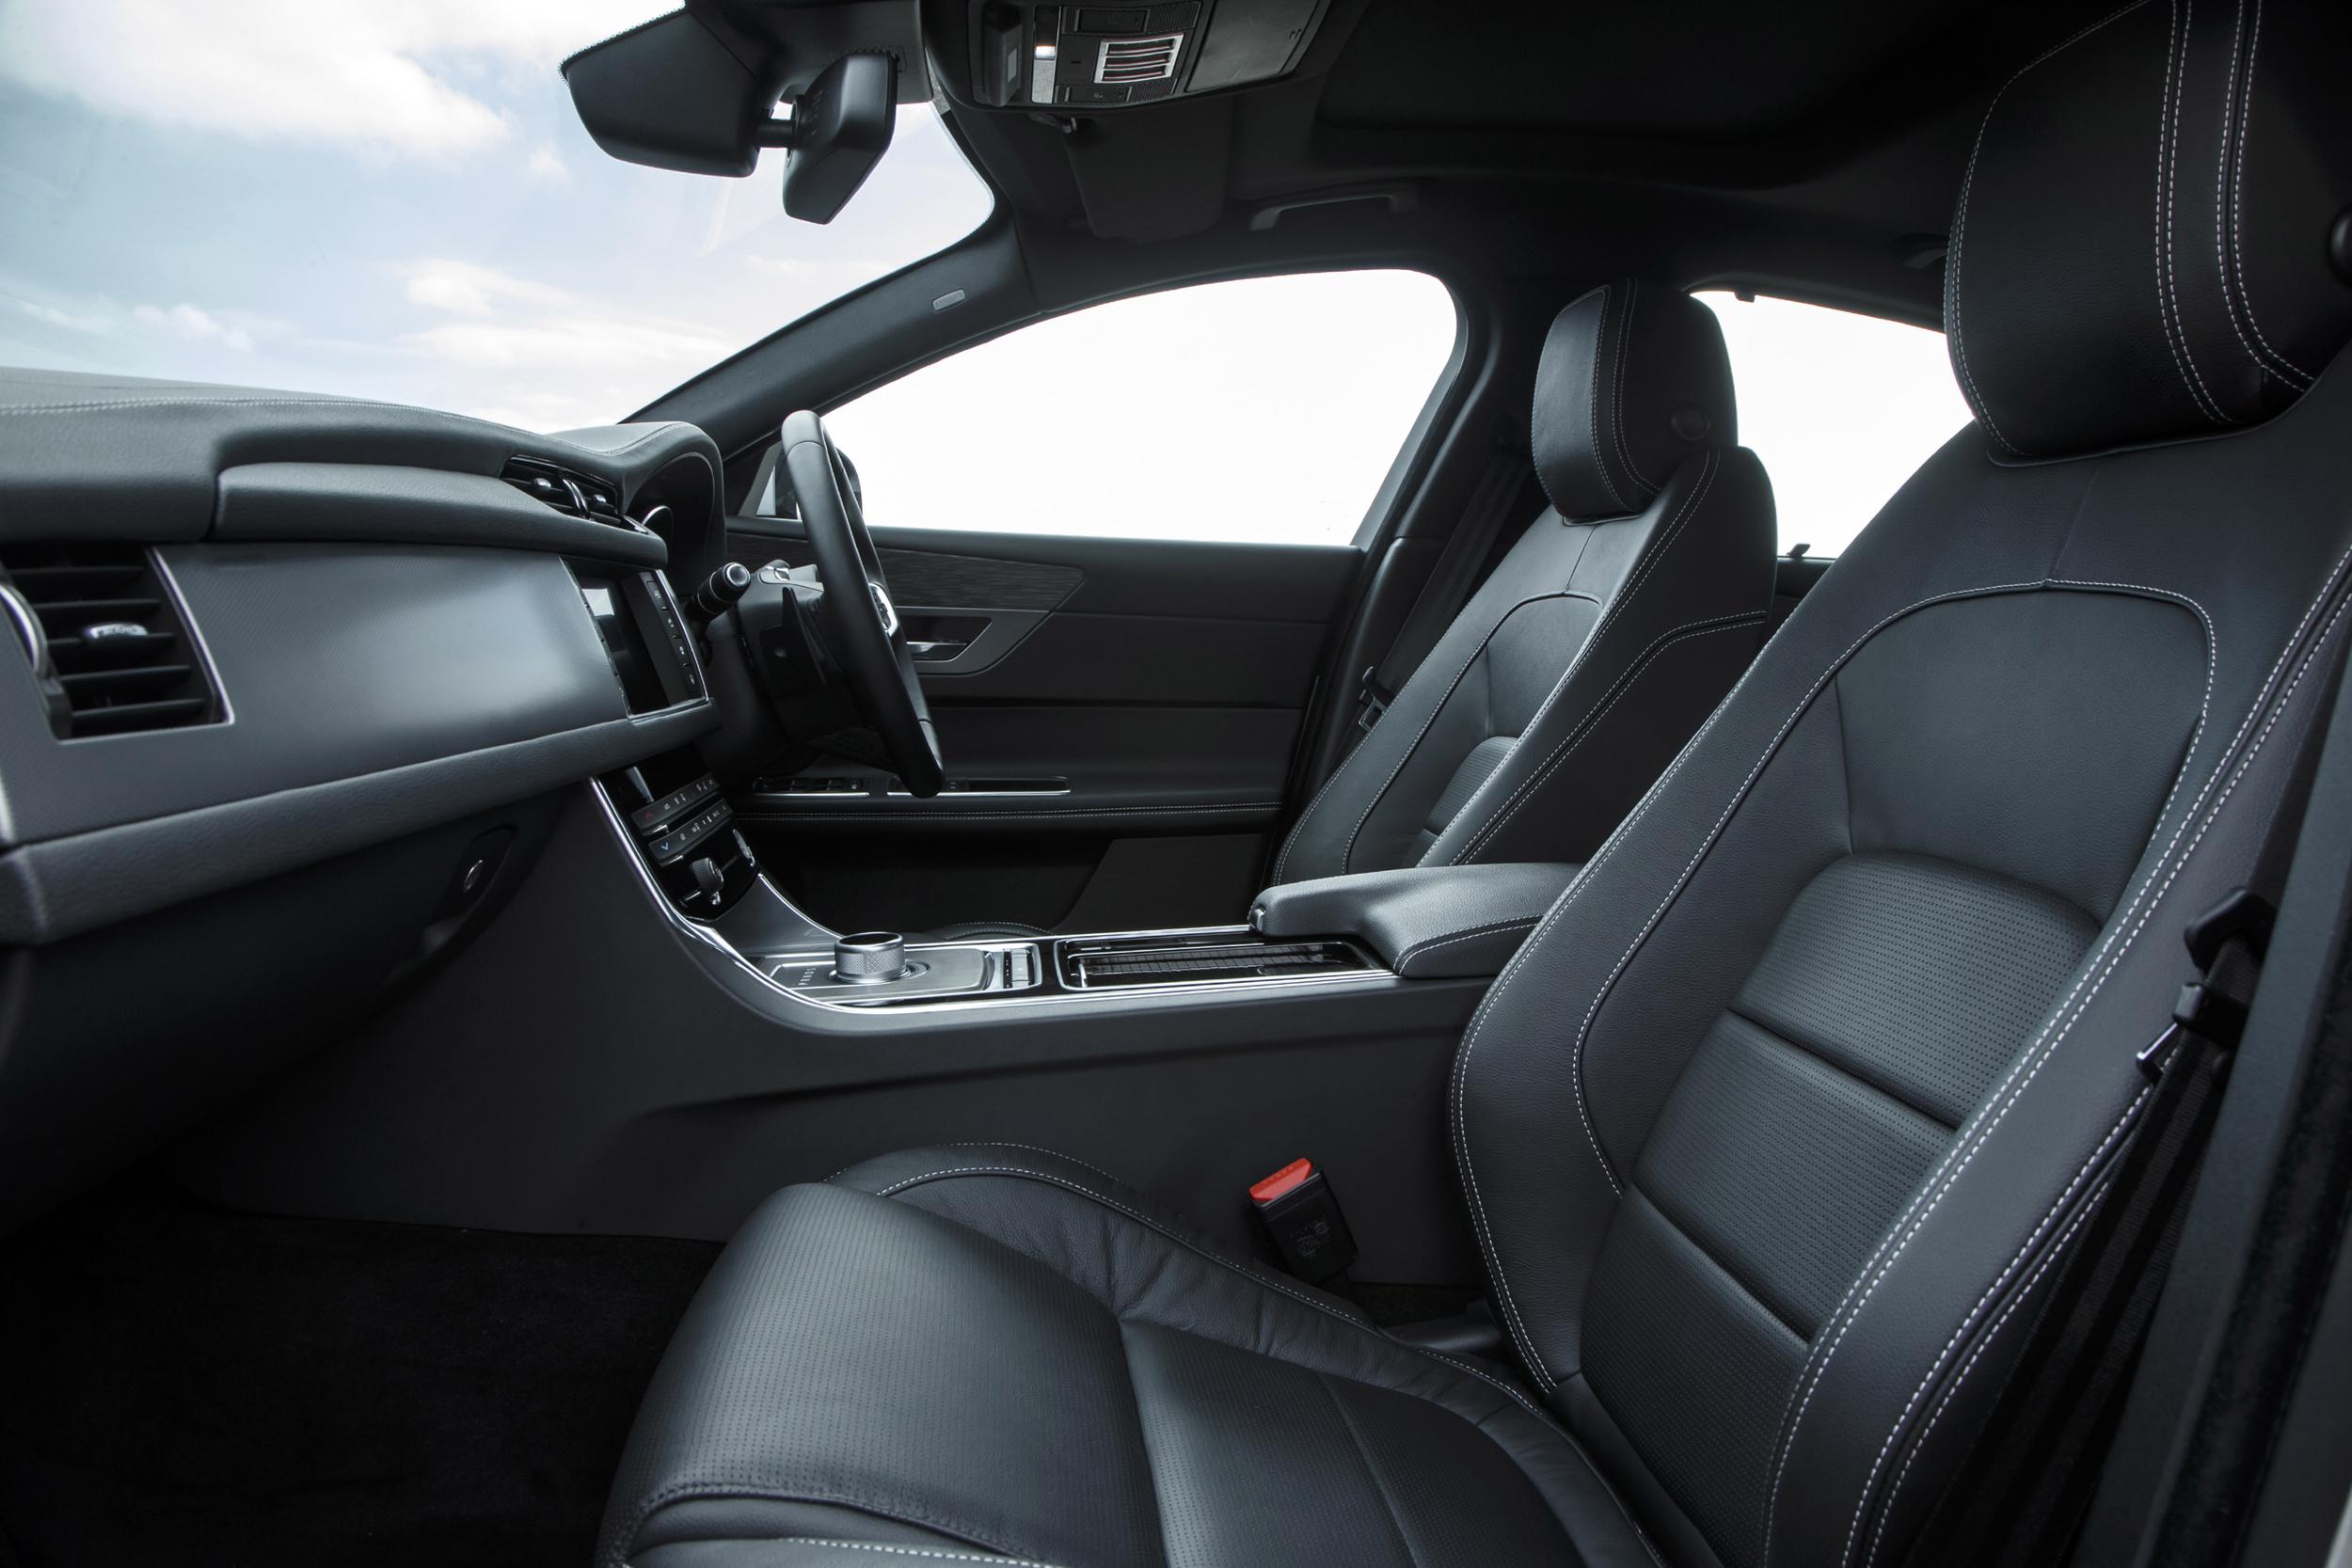 All-new Jaguar XF on sale